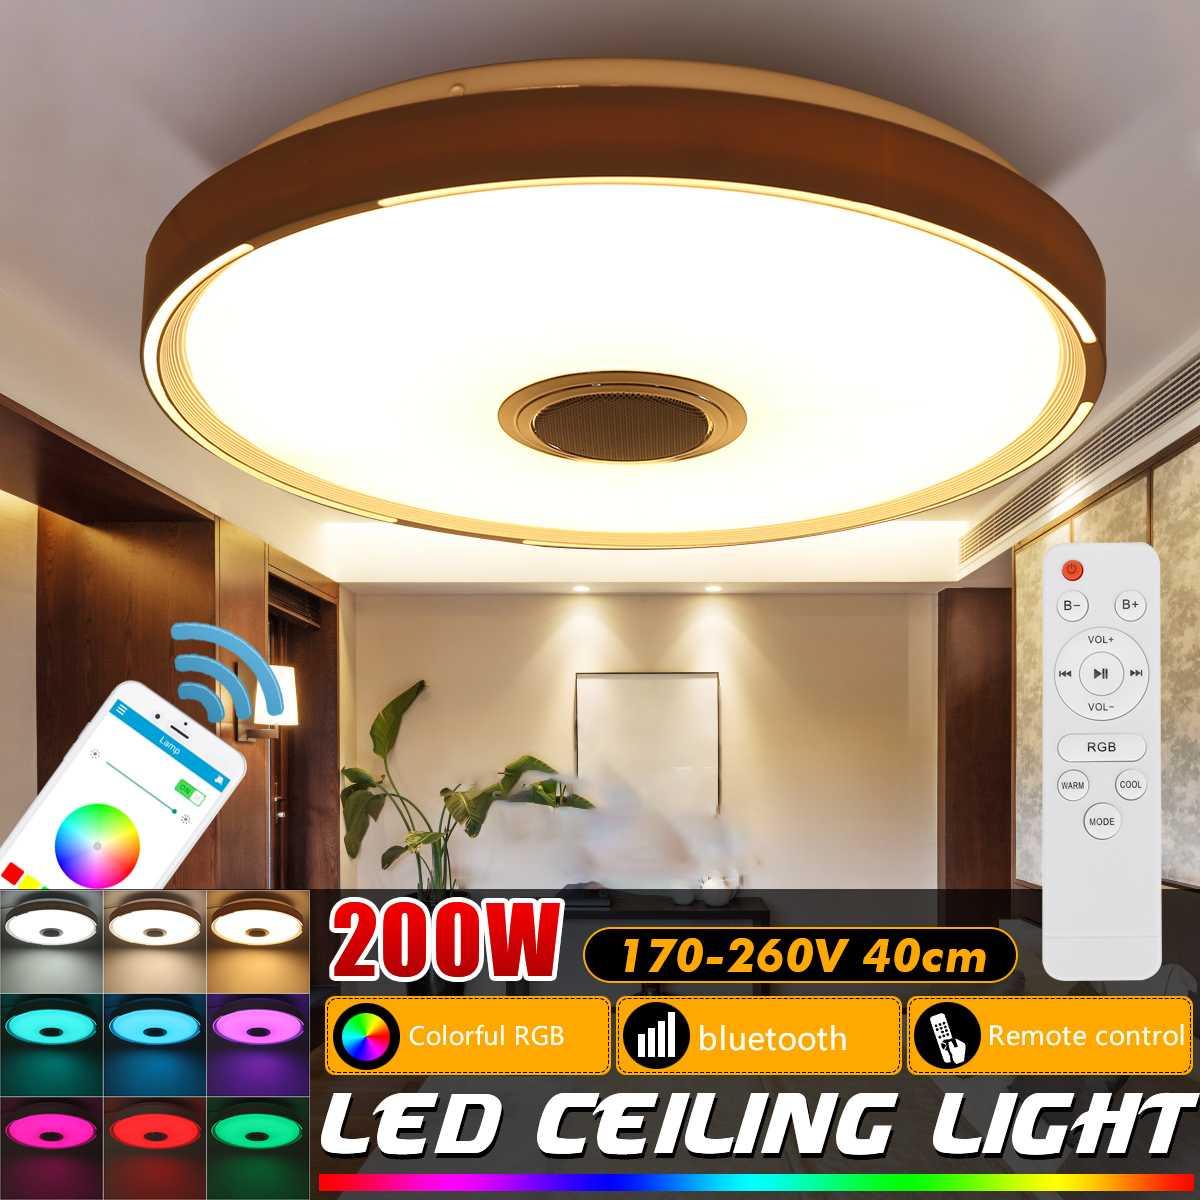 40cm RGB LED Ceiling Light Remote APP Control Ceiling Lights Acrylic Lamp 200W Smart bluetooth Speaker Music Lighting Fixture